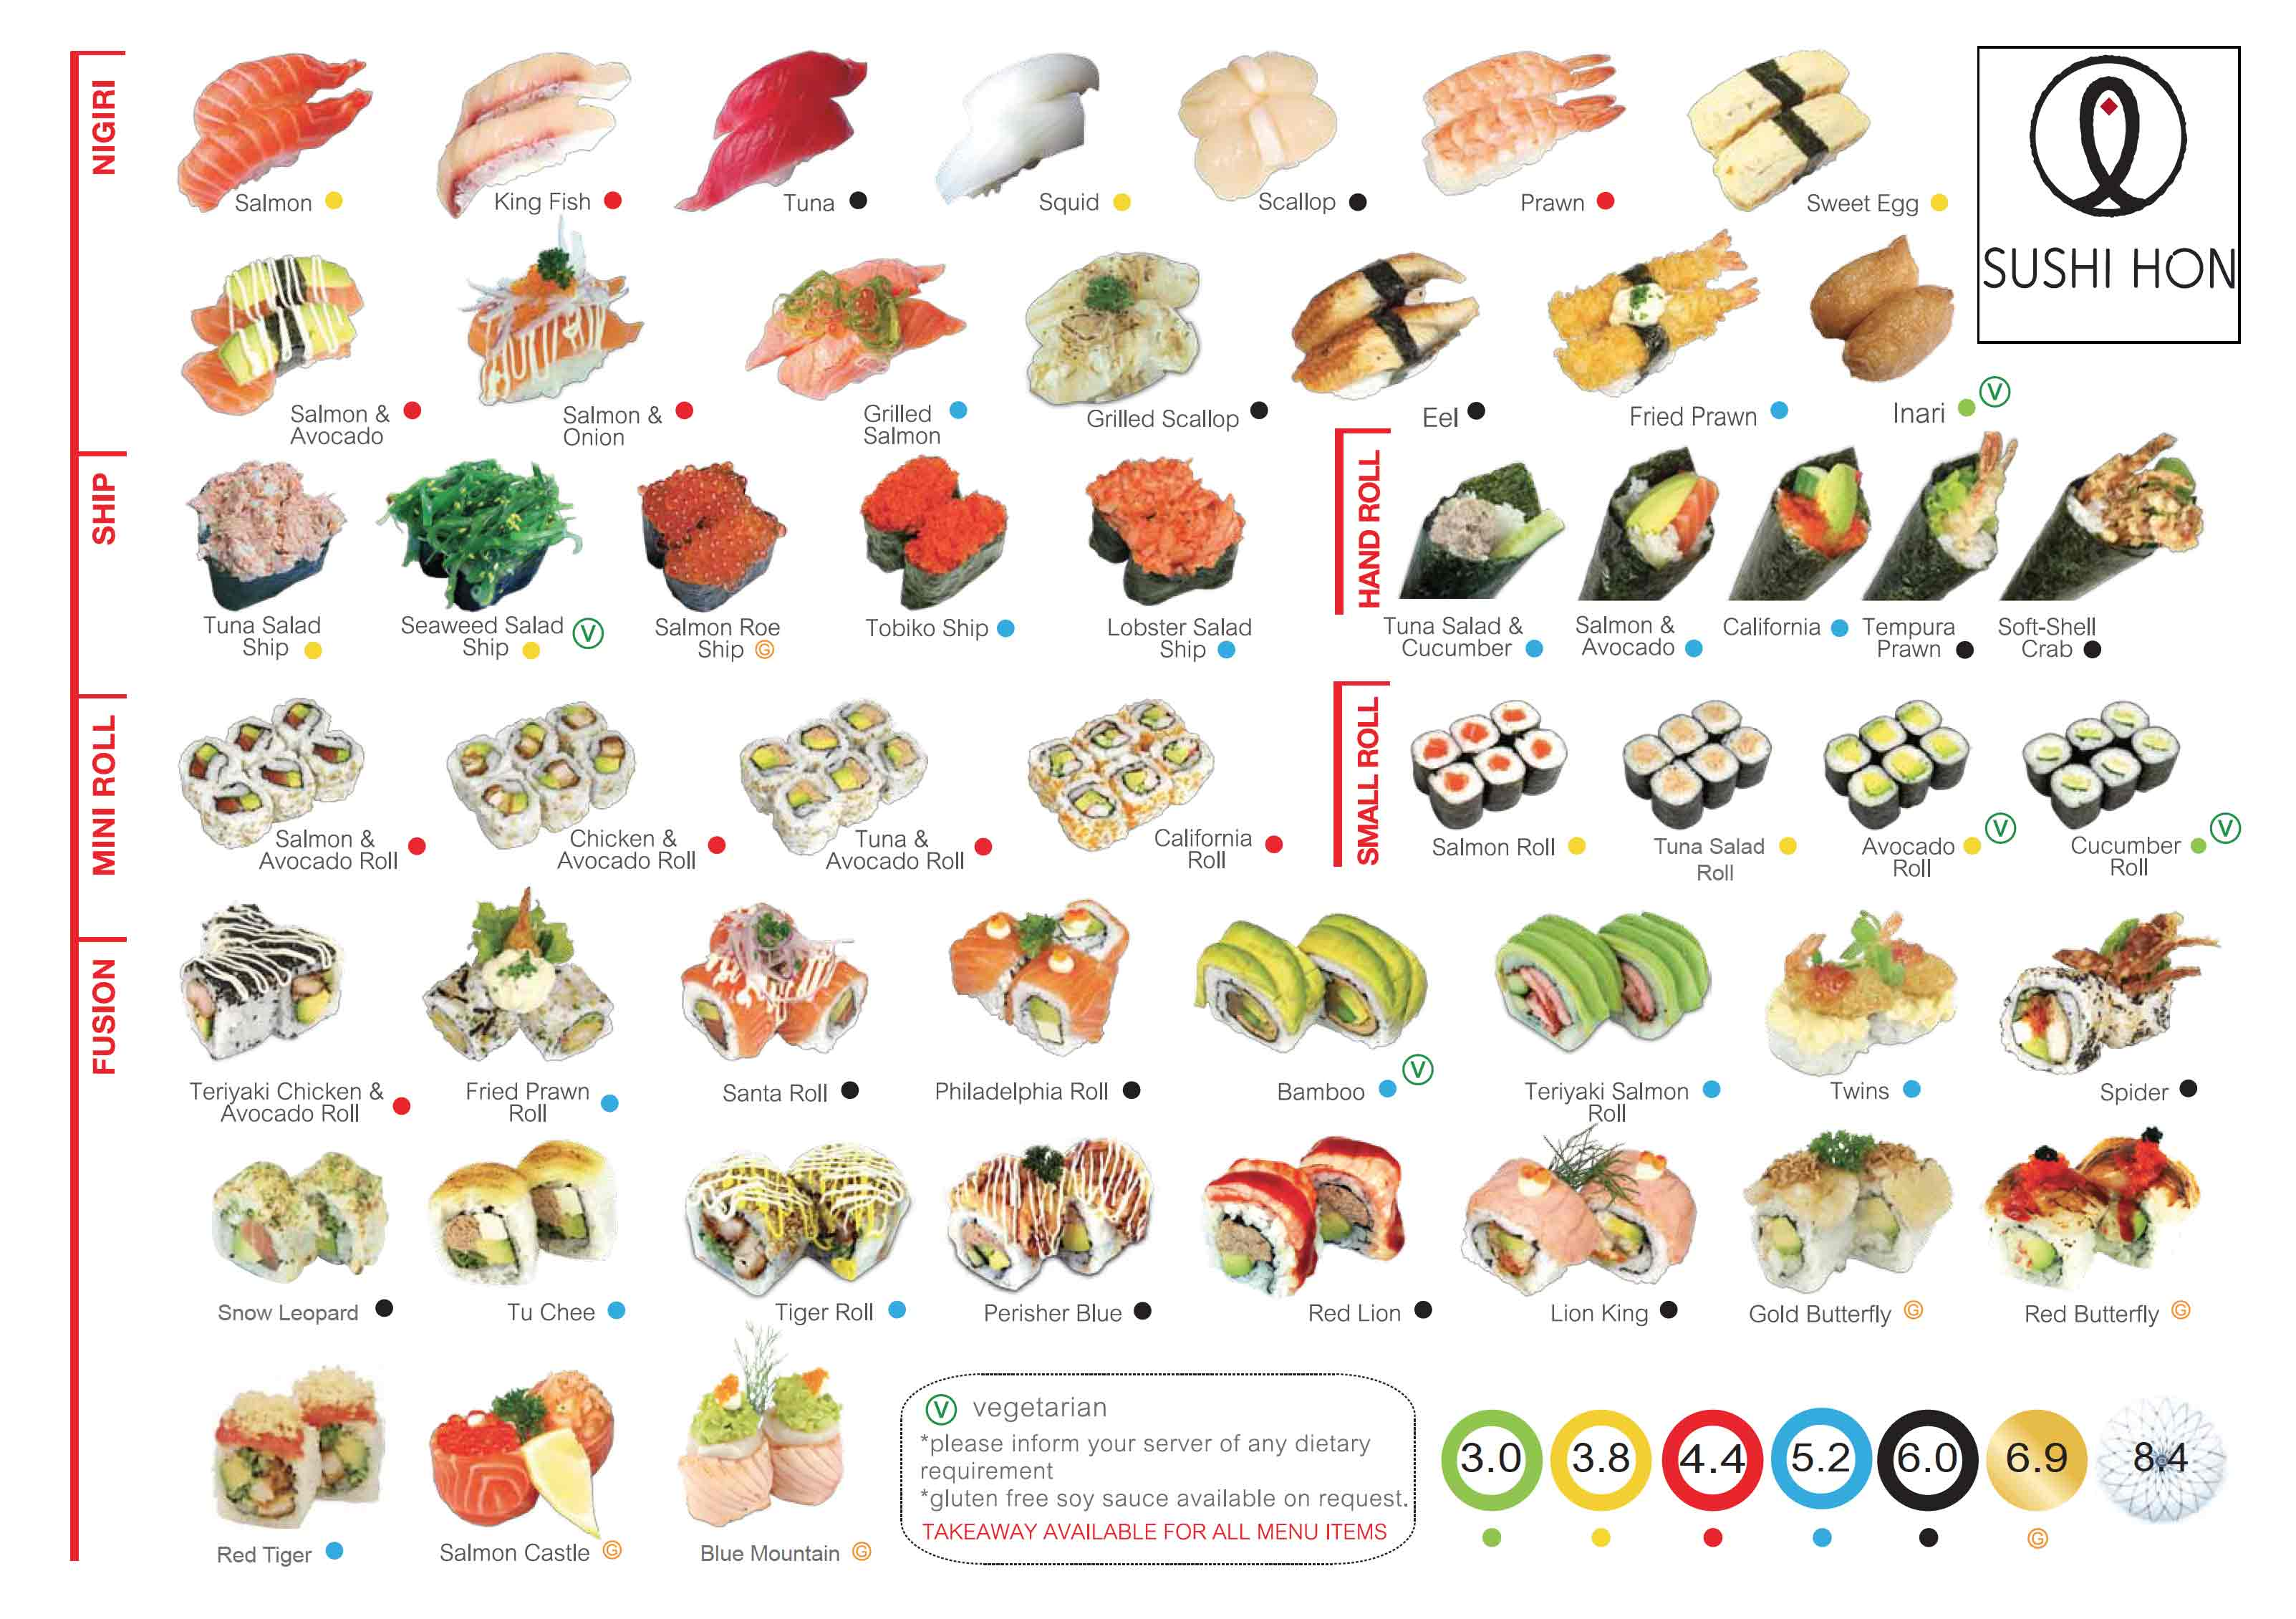 http://sushihon.com.au/wp-content/uploads/2016/06/sushi.pdf